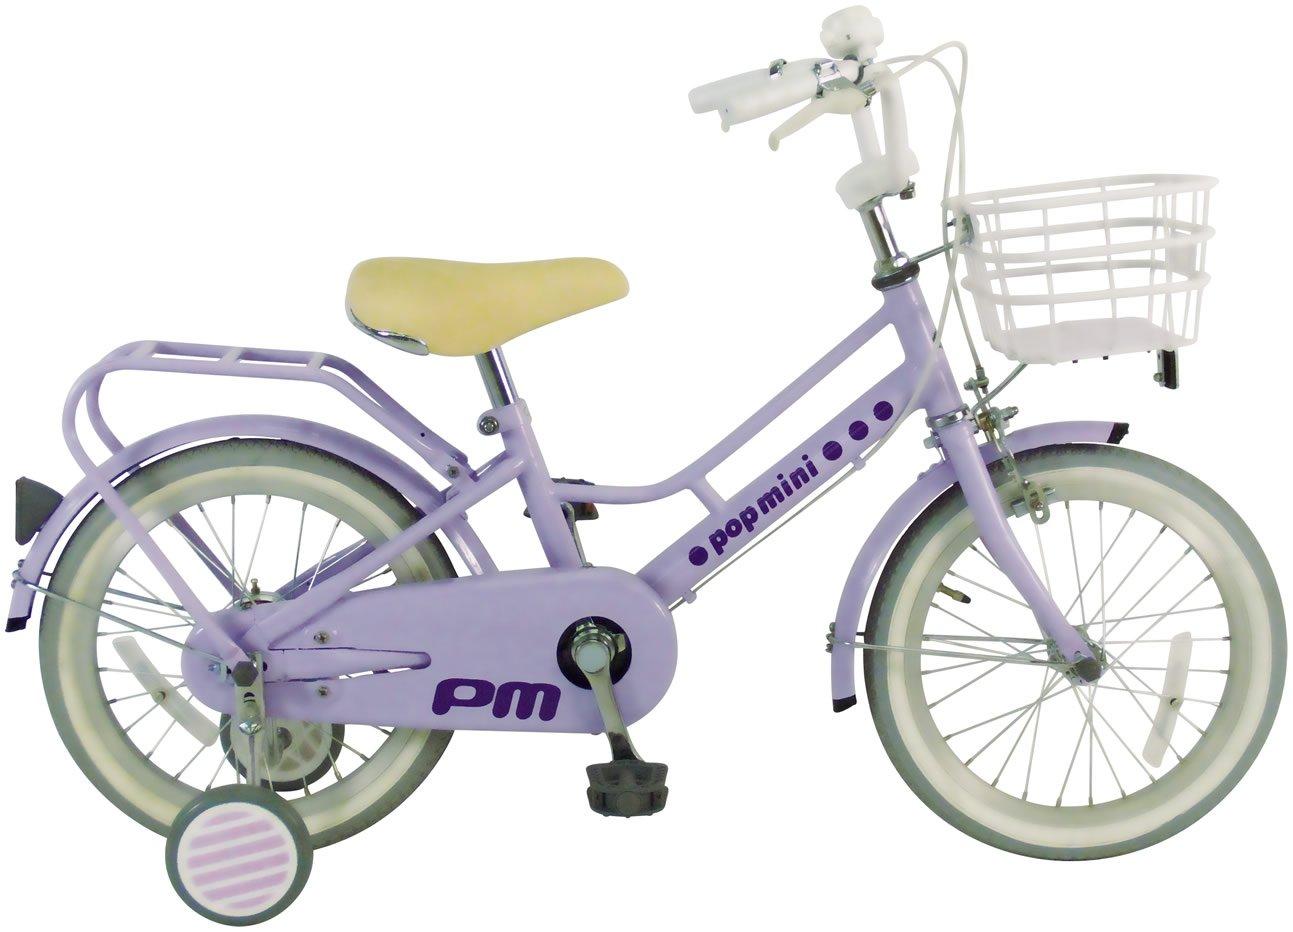 C.Dream(シードリーム) ポップミニ PM61 16インチ 幼児自転車 ラベンダー 100%組立済み発送 B072JFX3HF